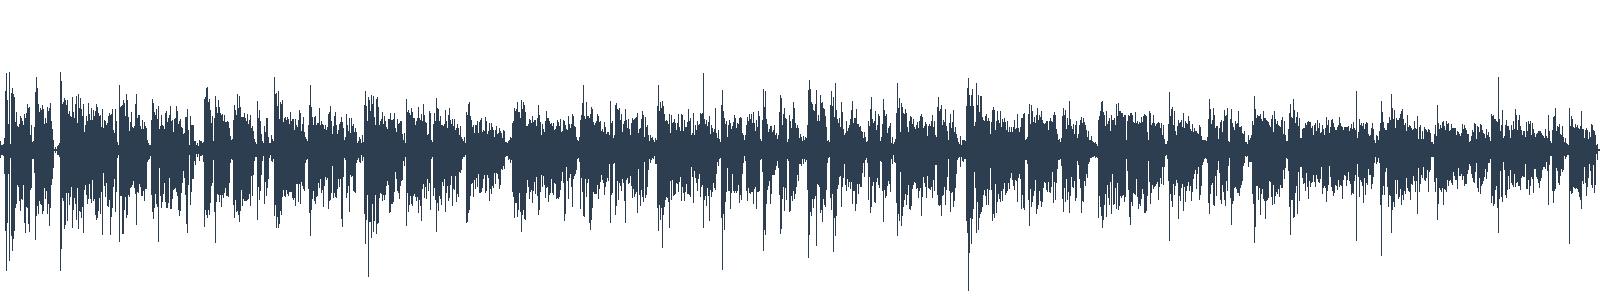 Nové audioknihy 41/2019 waveform